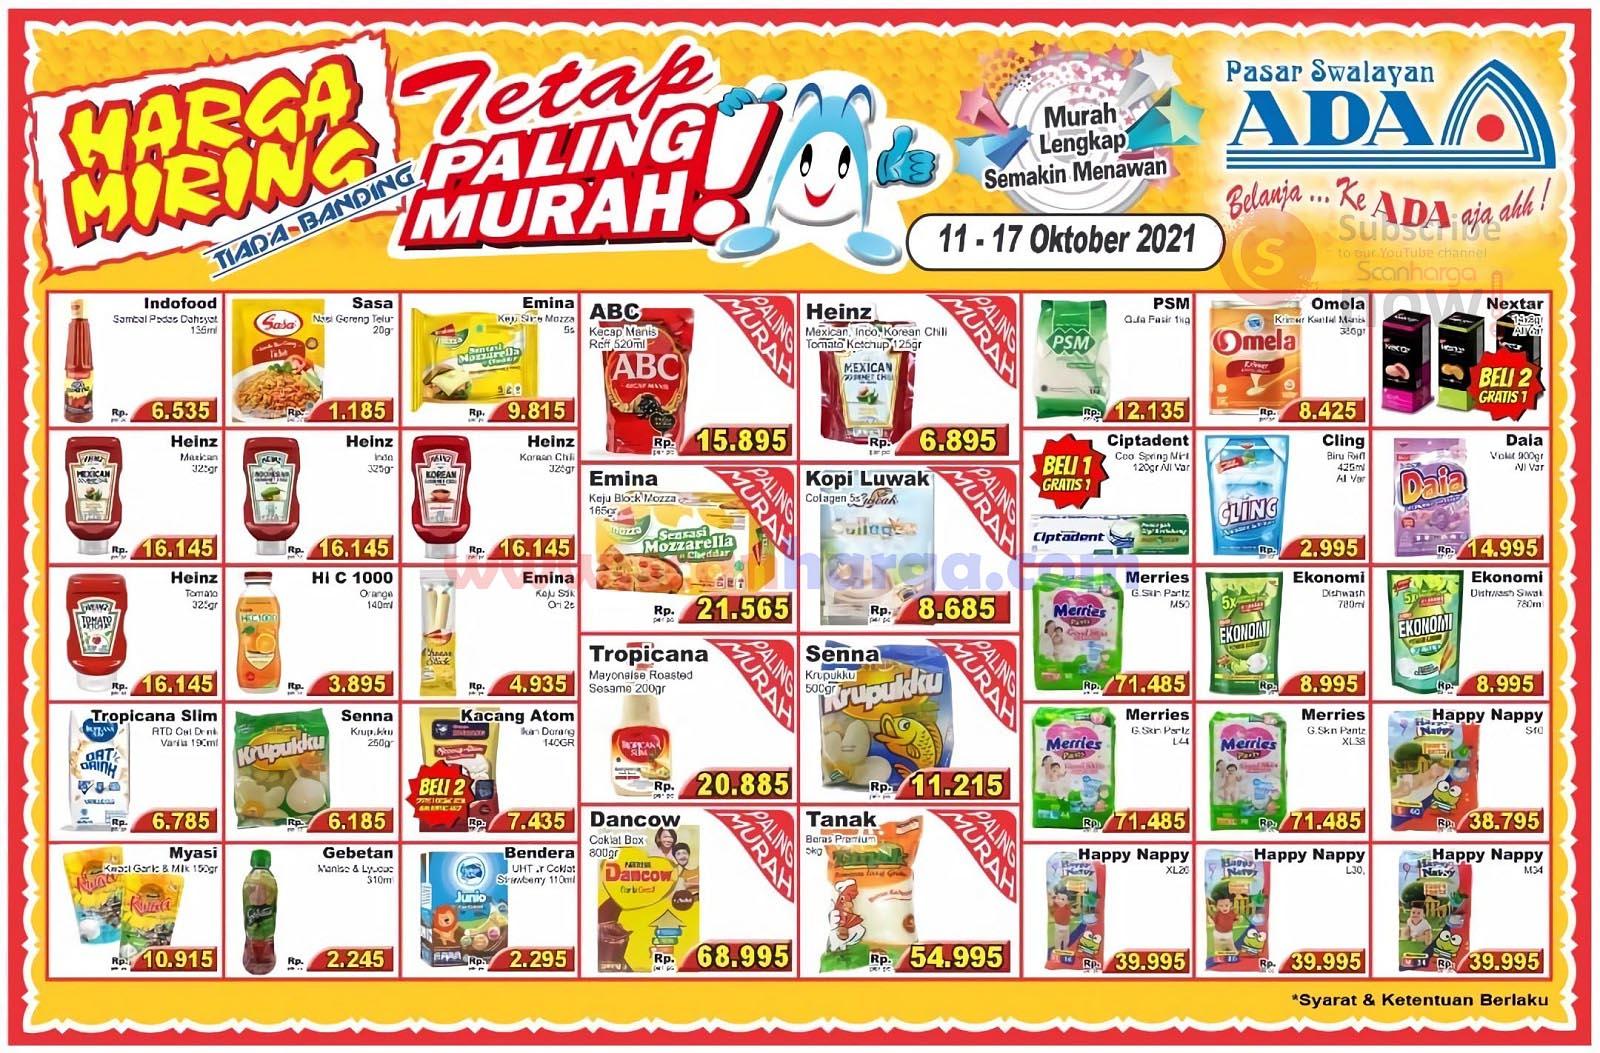 Katalog Promo ADA Swalayan Weekend 11 - 17 Oktober 2021